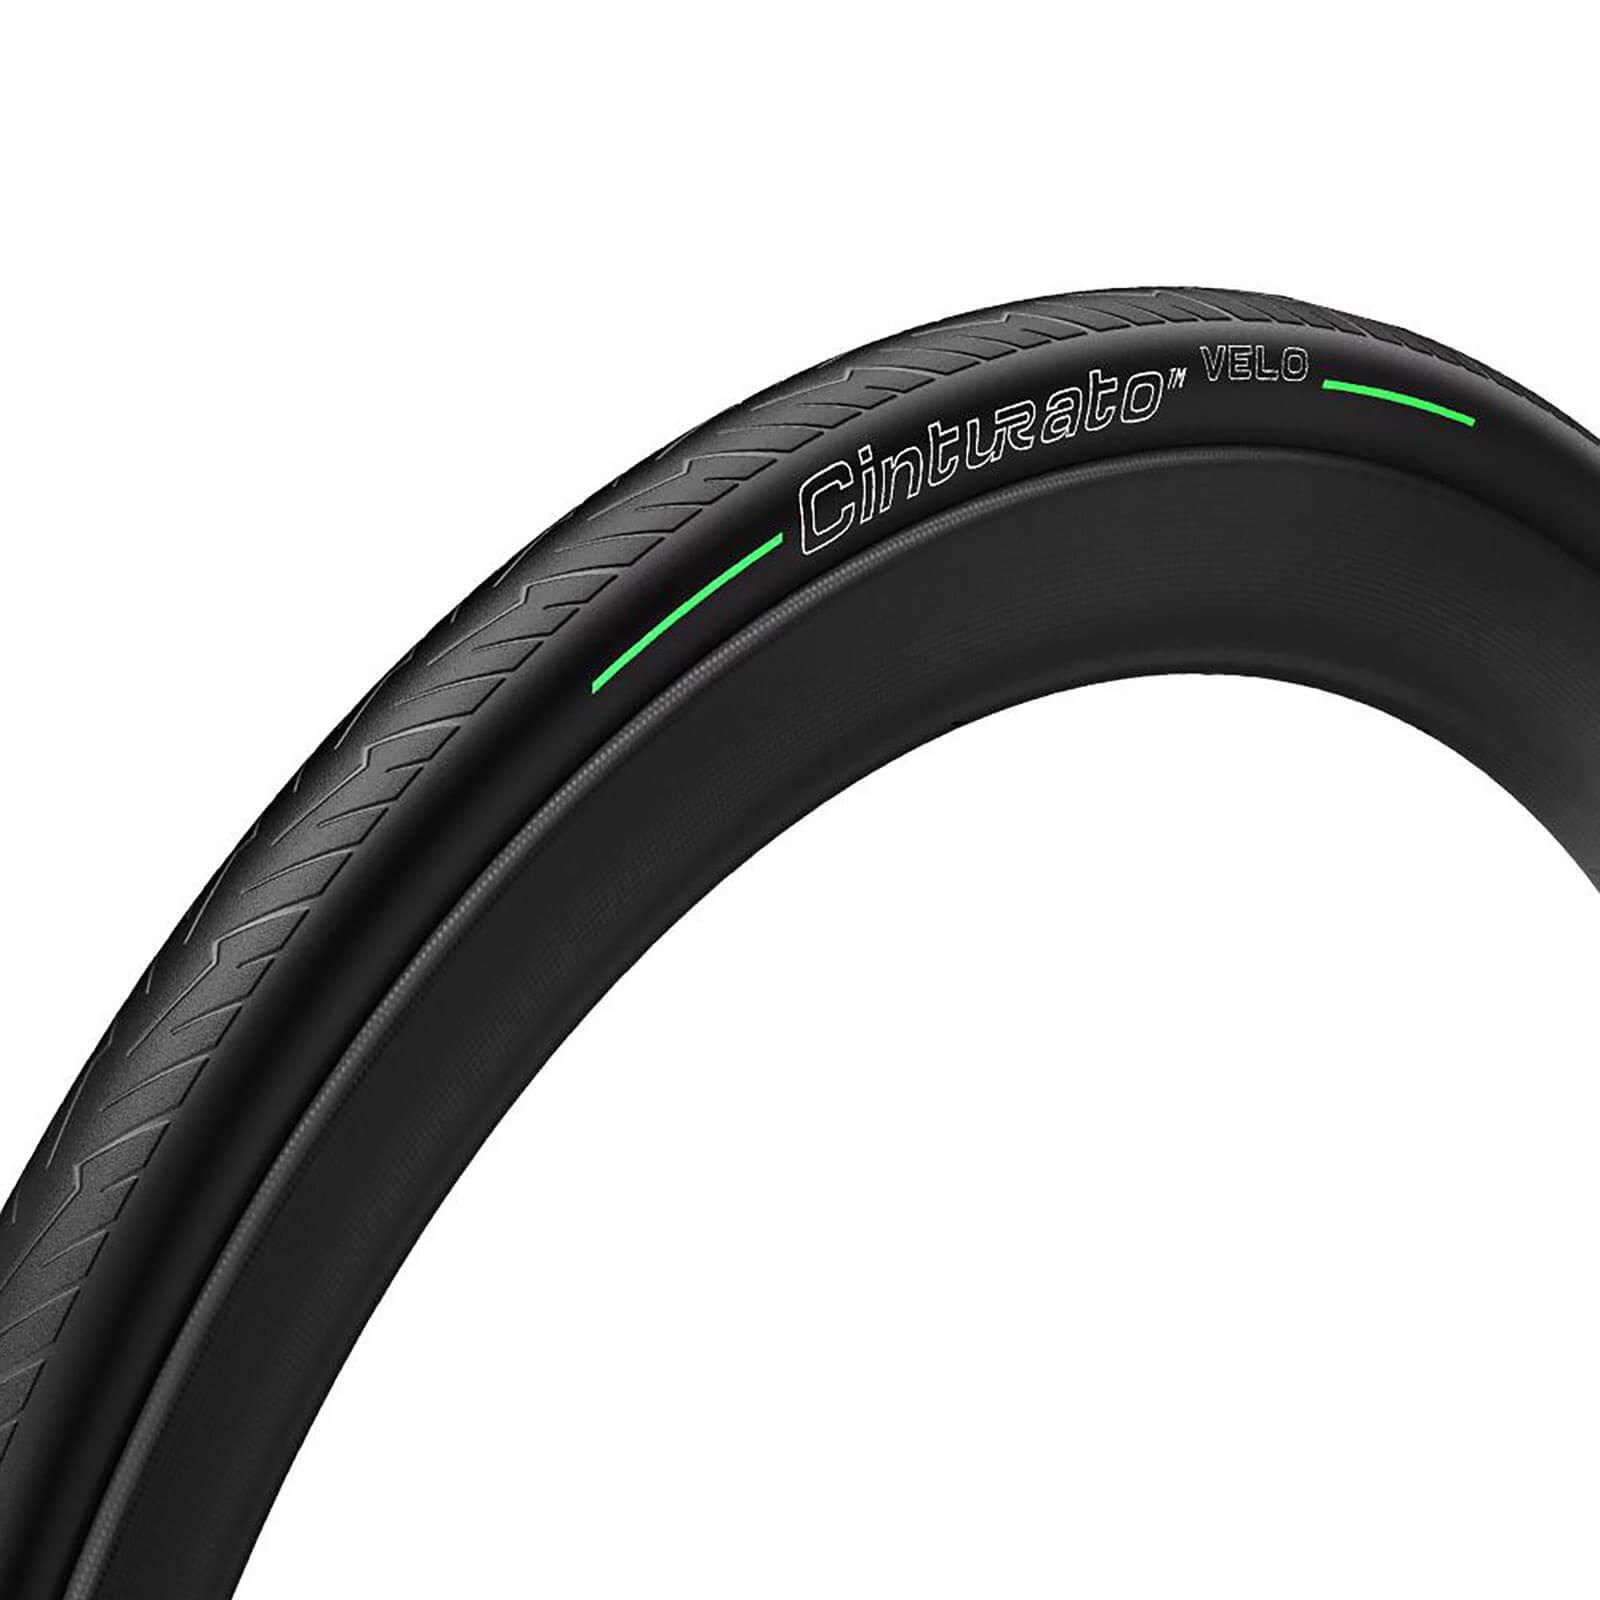 Pirelli Cinturato Velo Tubeless Ready Folding Road Tire - 700x26c